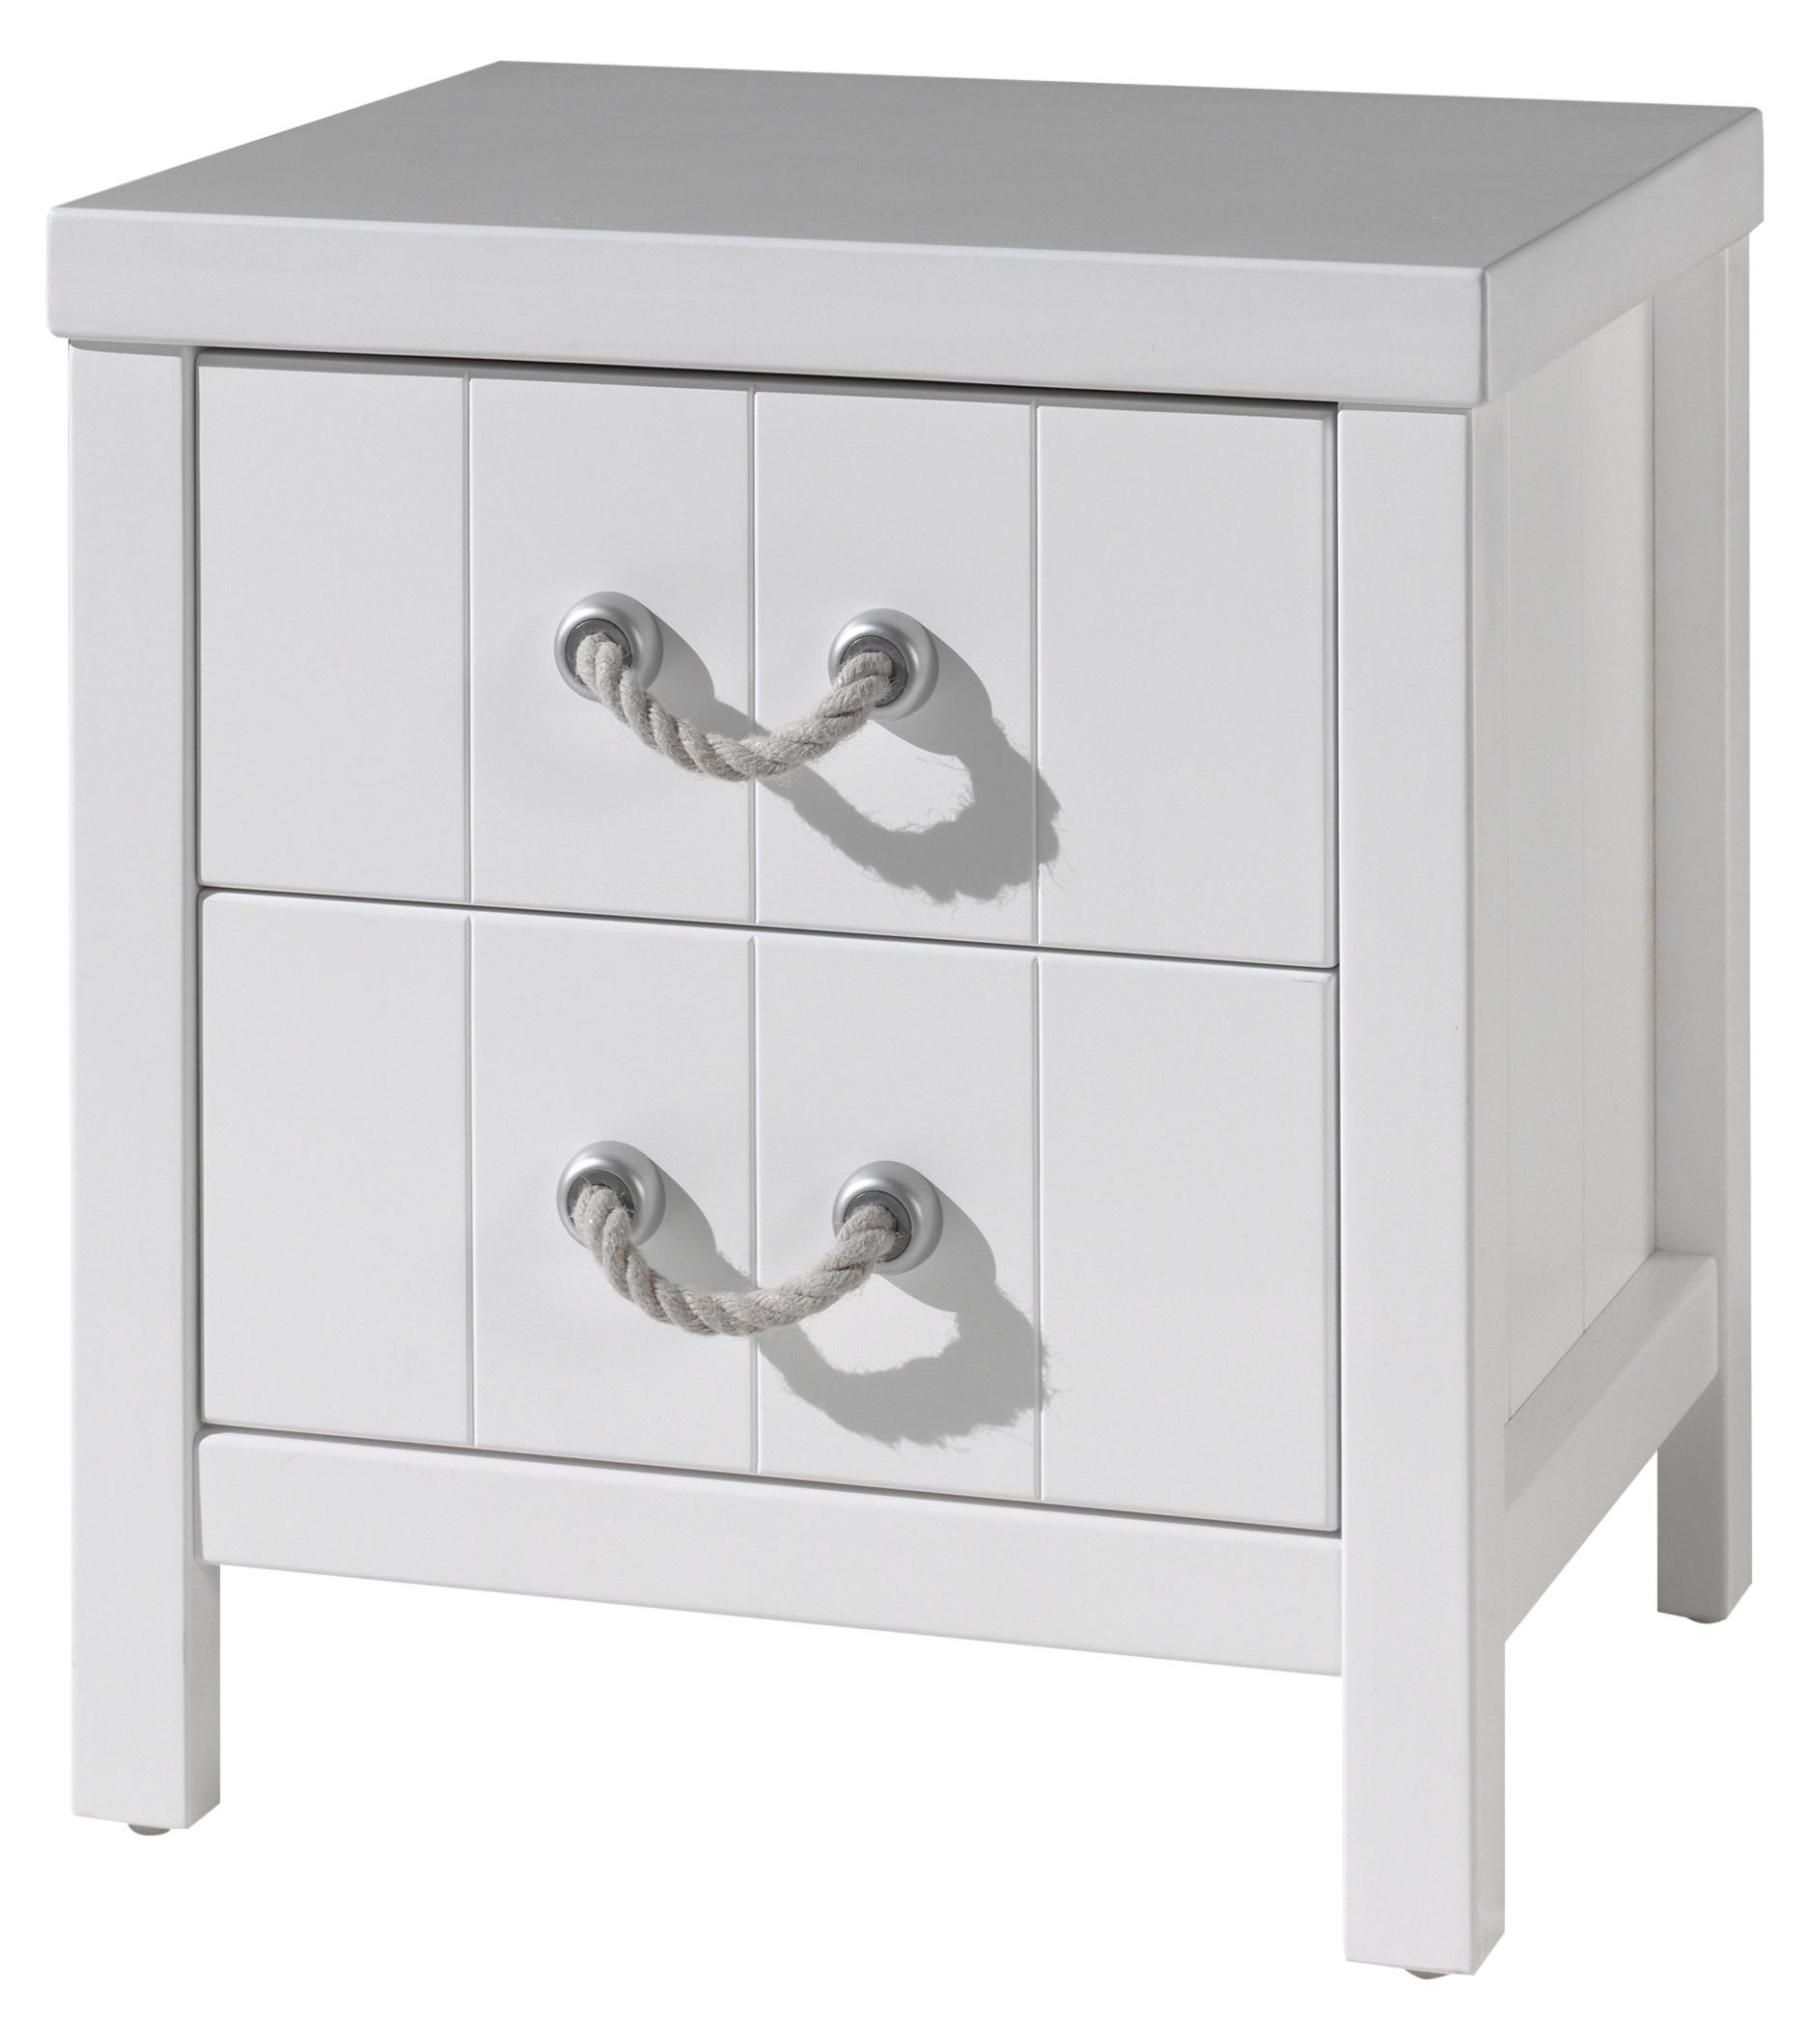 table de chevet 2 tiroirs laqu blanc marin. Black Bedroom Furniture Sets. Home Design Ideas